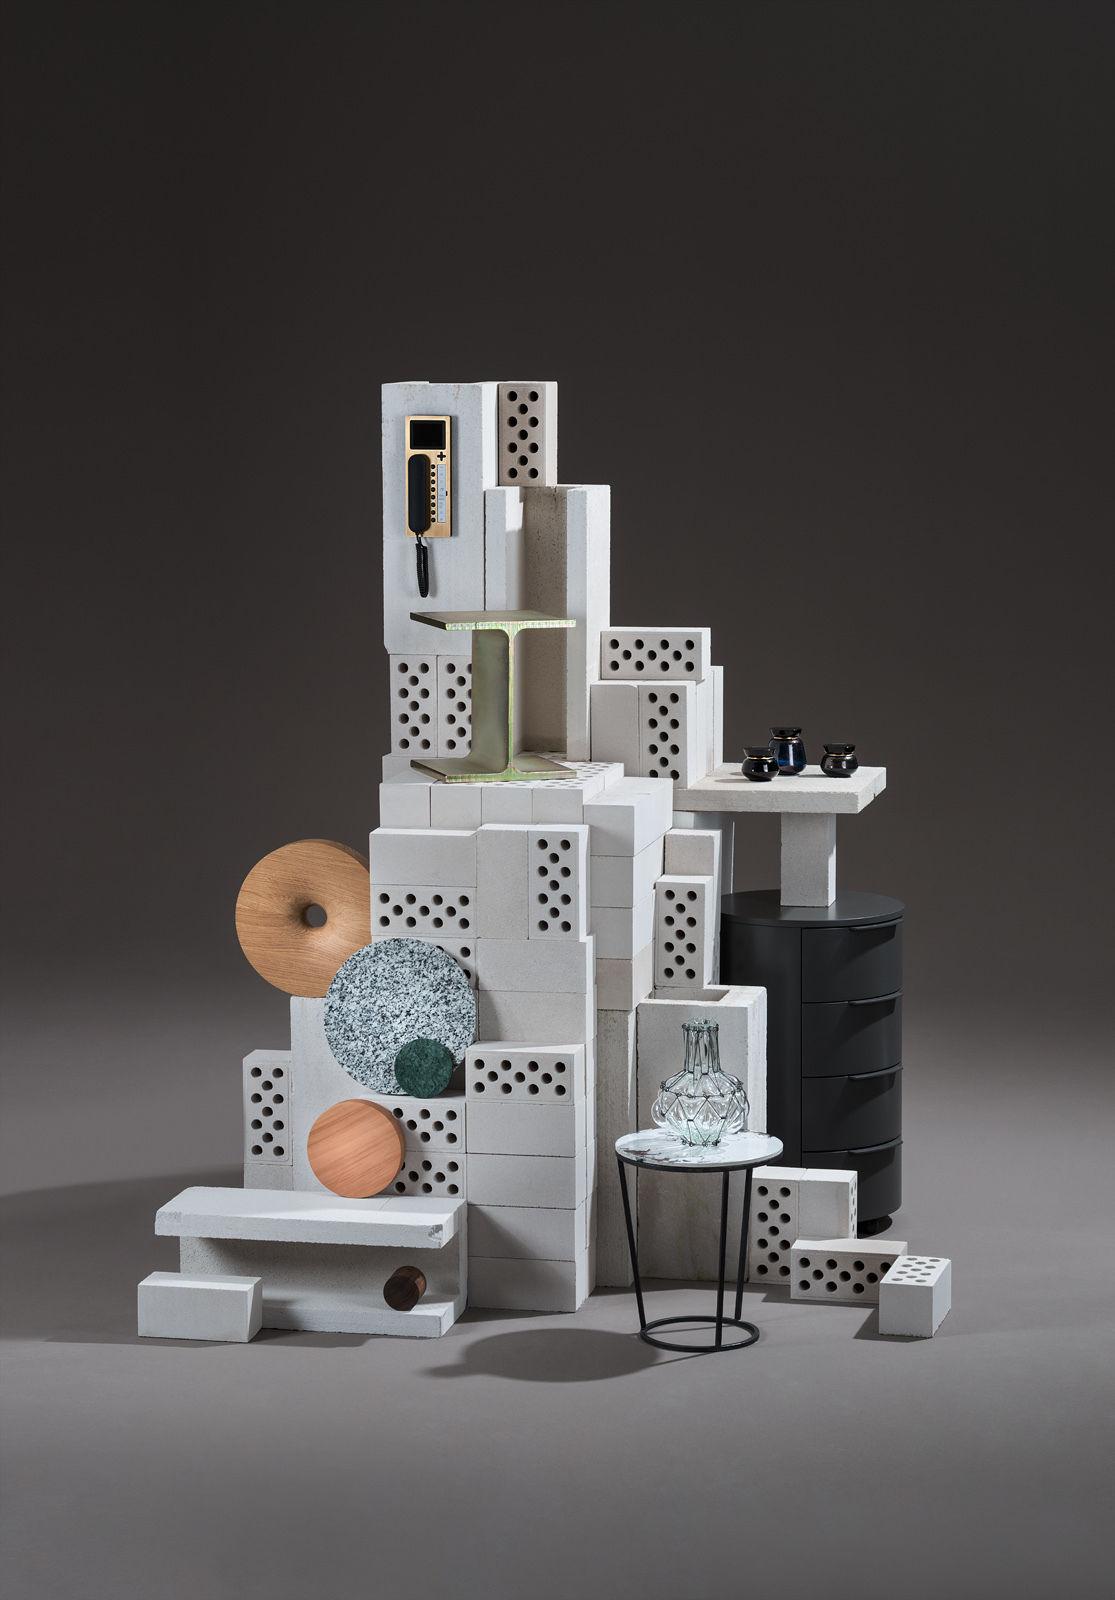 Building Blocks / Christian Hagemann for Wallpaper*